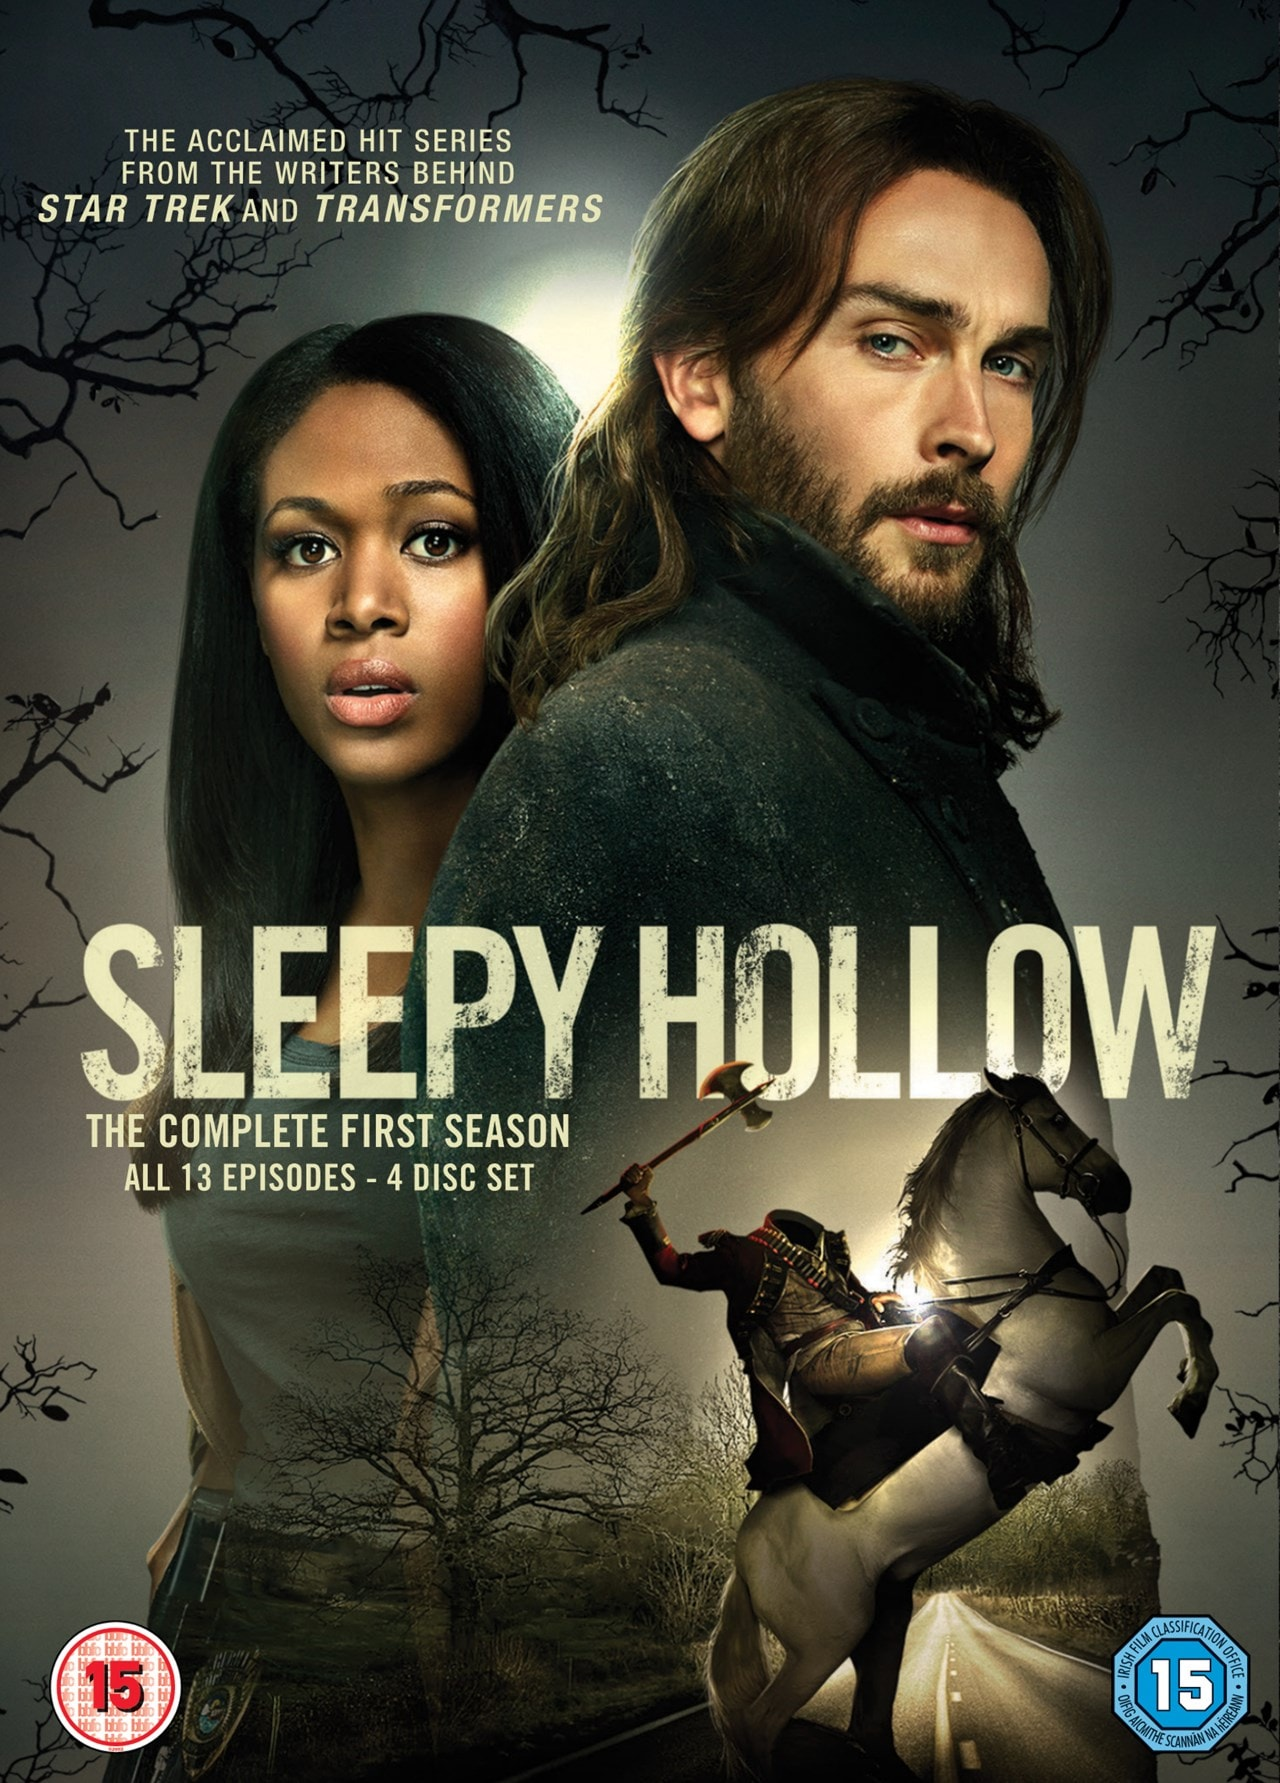 Sleepy Hollow: The Complete First Season - 1